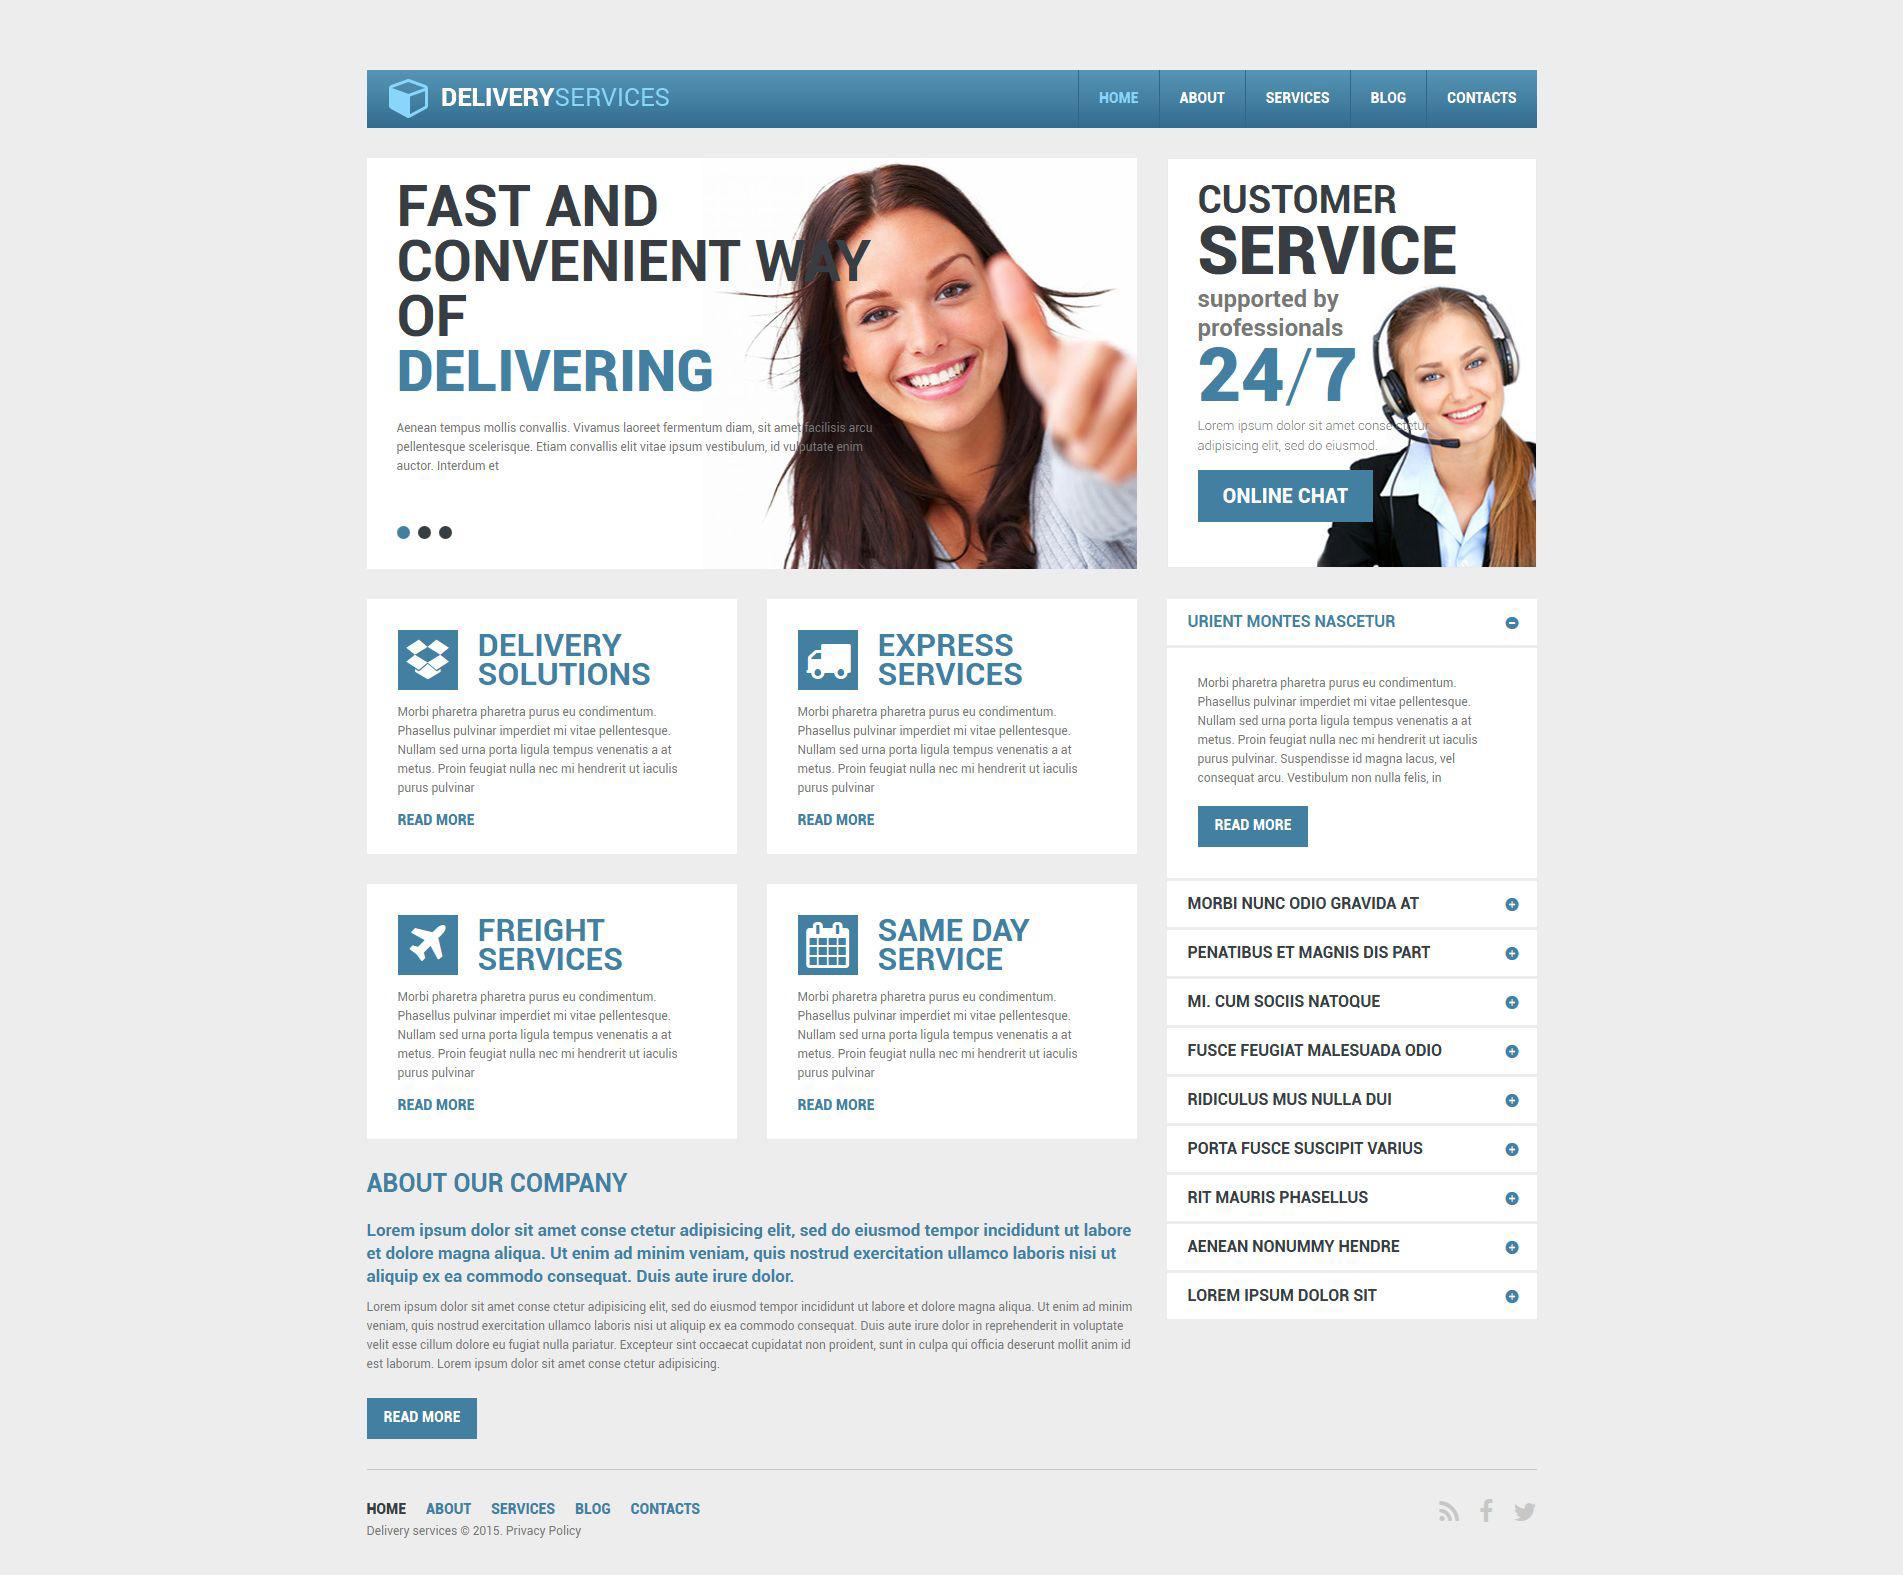 courier service website template wordpress theme and templates for by owner website template listing